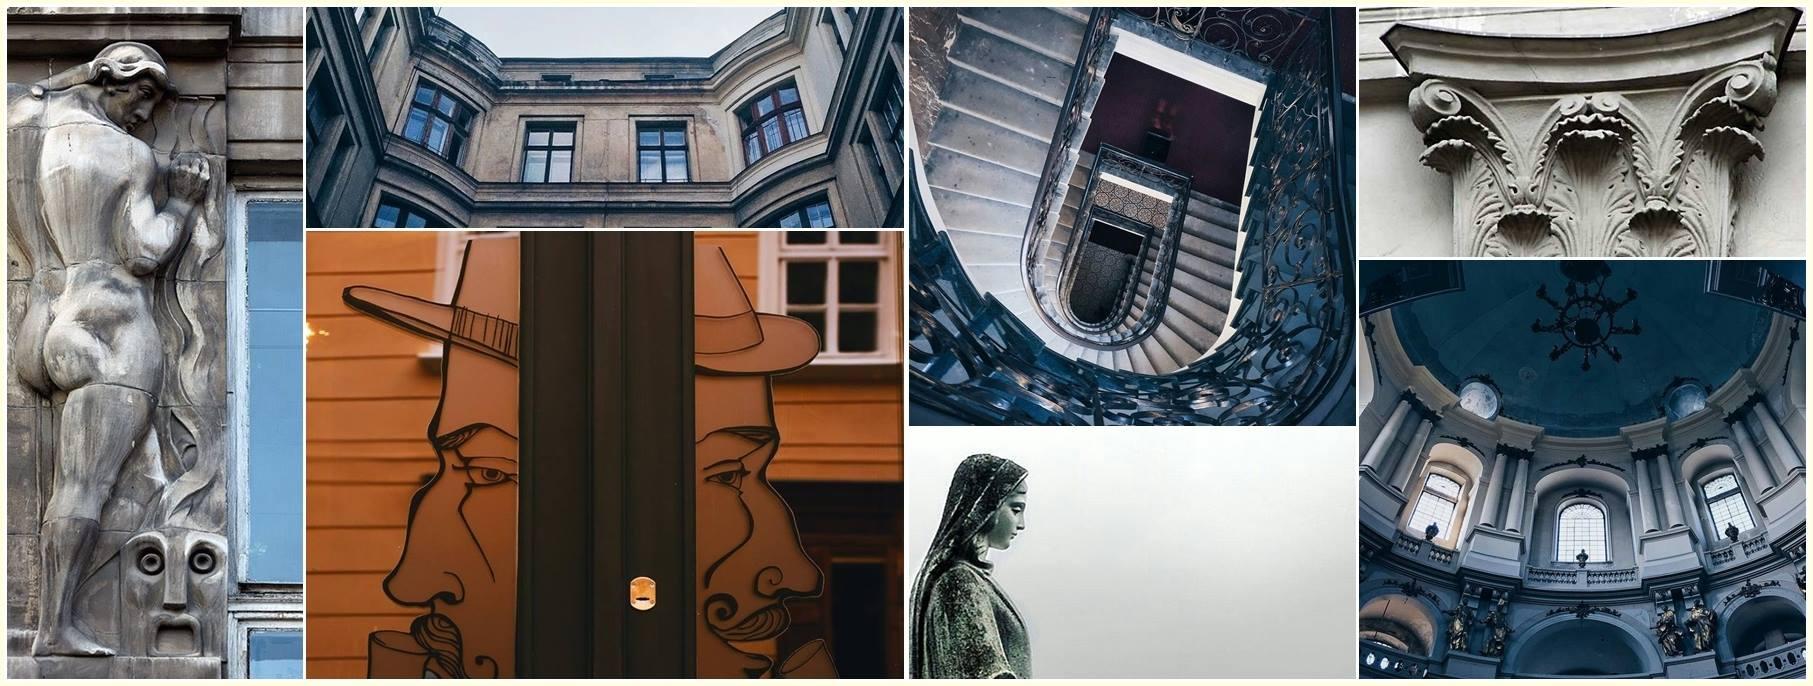 Lviv Turizm Danışma Merkezi, Lviv Tourism office, lviv danışma, Lviv de yapılacaklar listesi, Lviv Truzim Ofis Nerdedir, Lviv Tourist Information Center